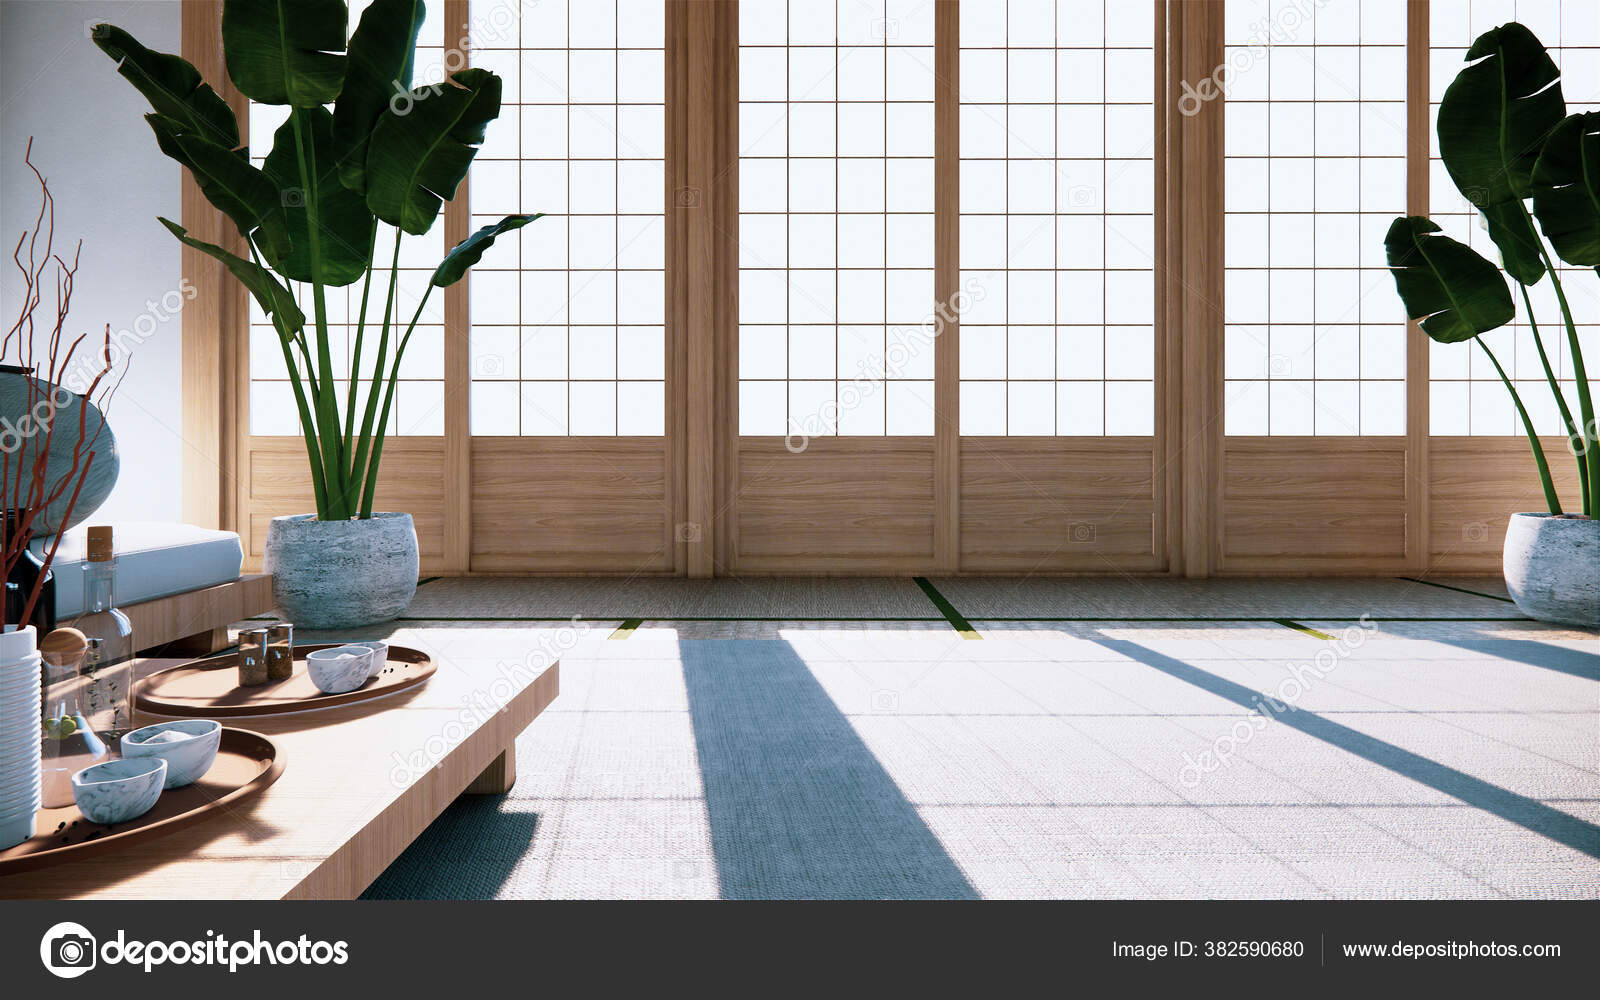 Multi Function Room Ideas Japanese Room Interior Design Rendering Stock Photo C Minny0012011 Gmail Com 382590680